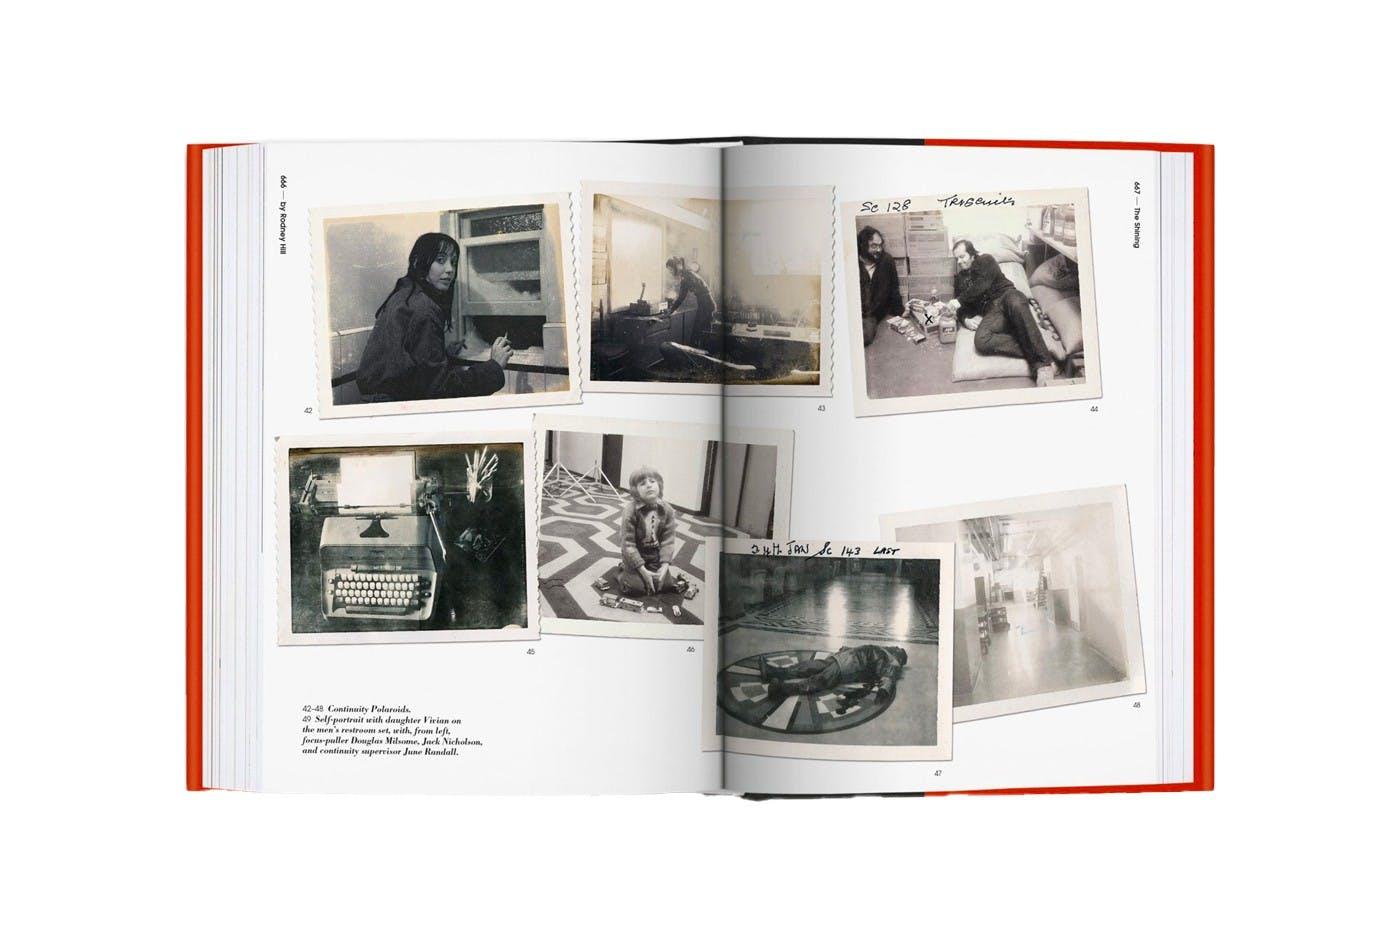 Stanley Kubrick - Taschen book - Bibliotecha Universalis.